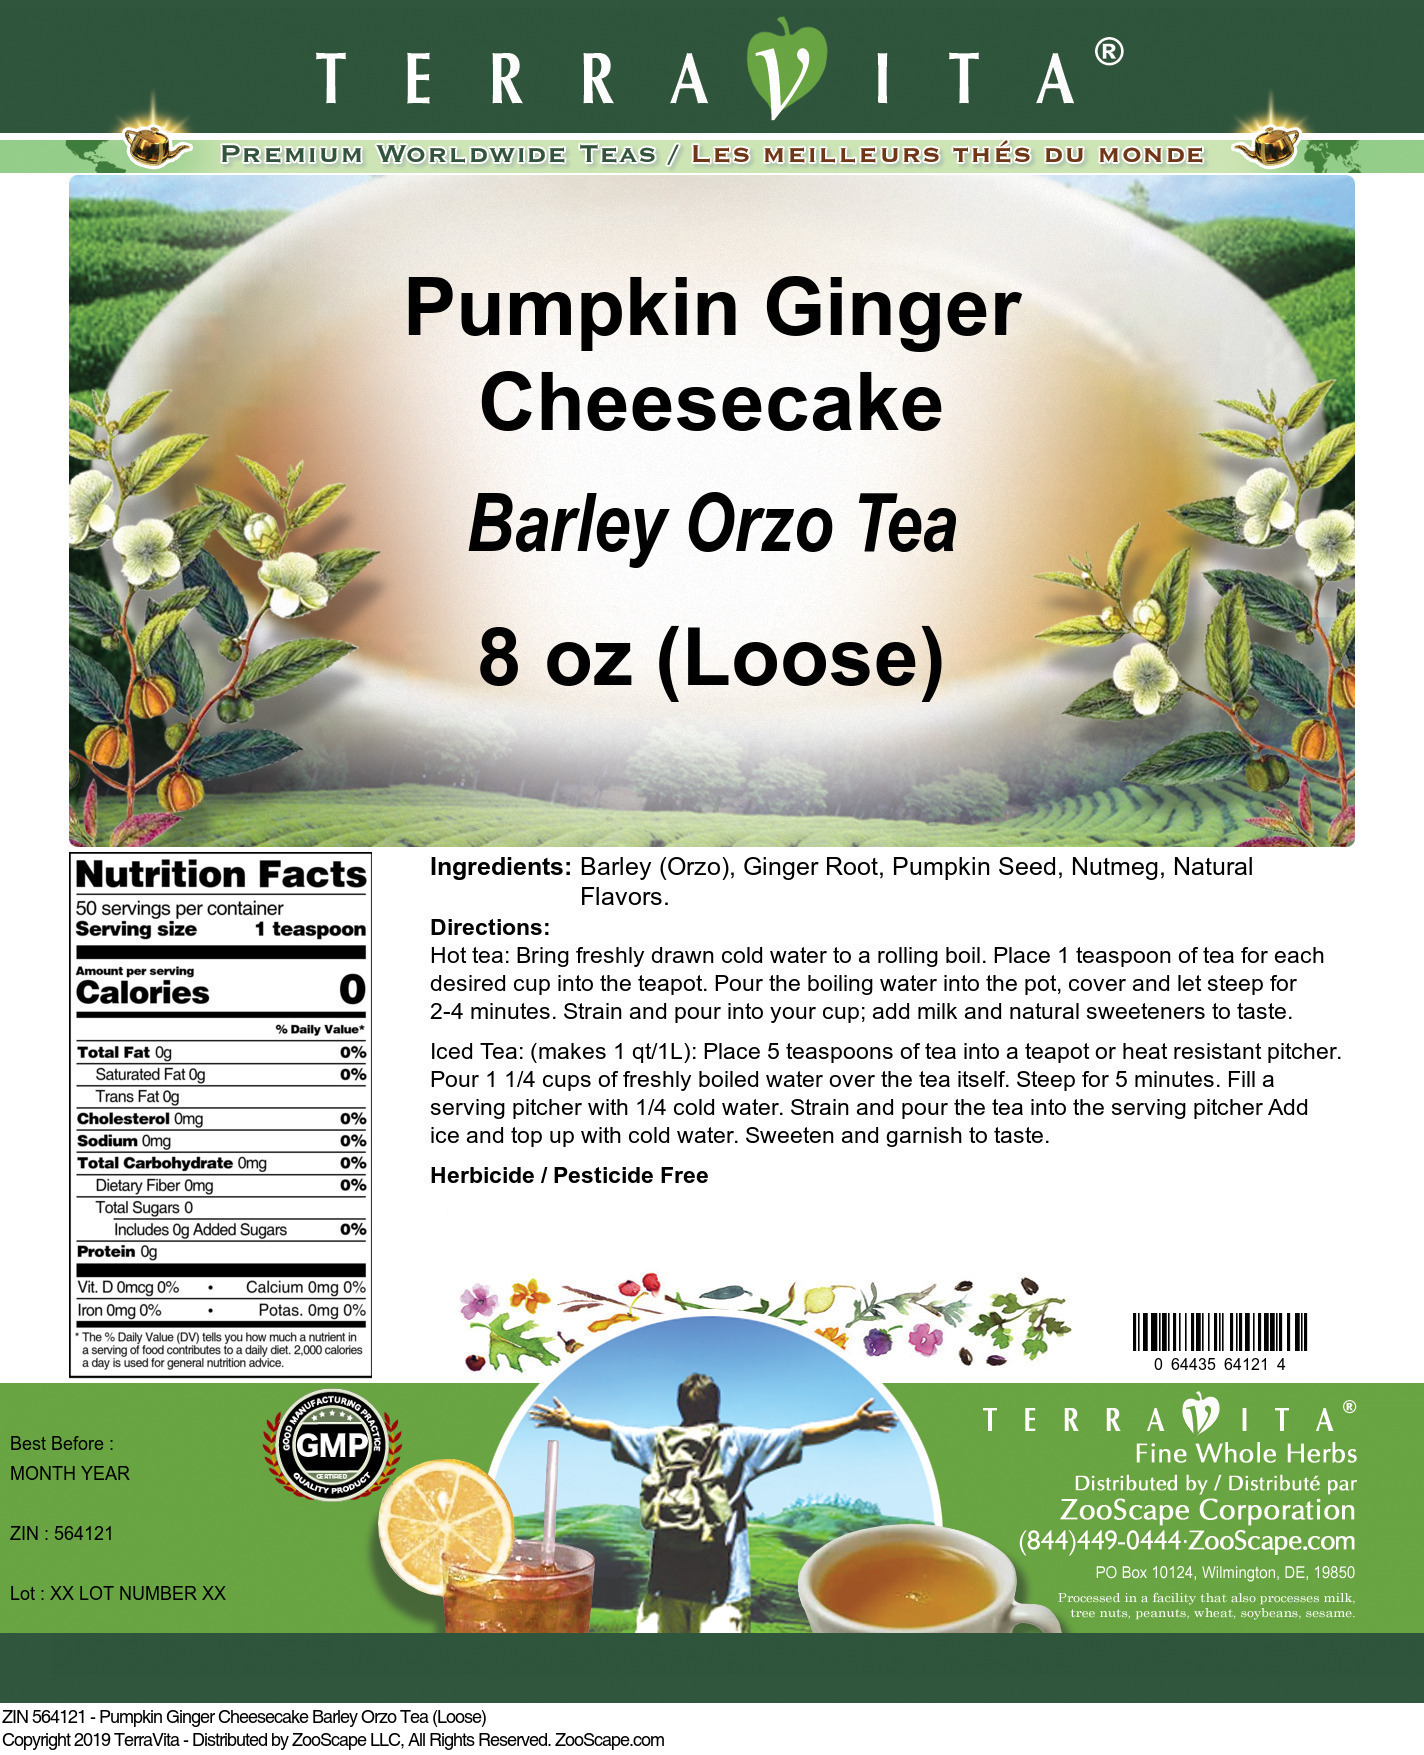 Pumpkin Ginger Cheesecake Barley Orzo